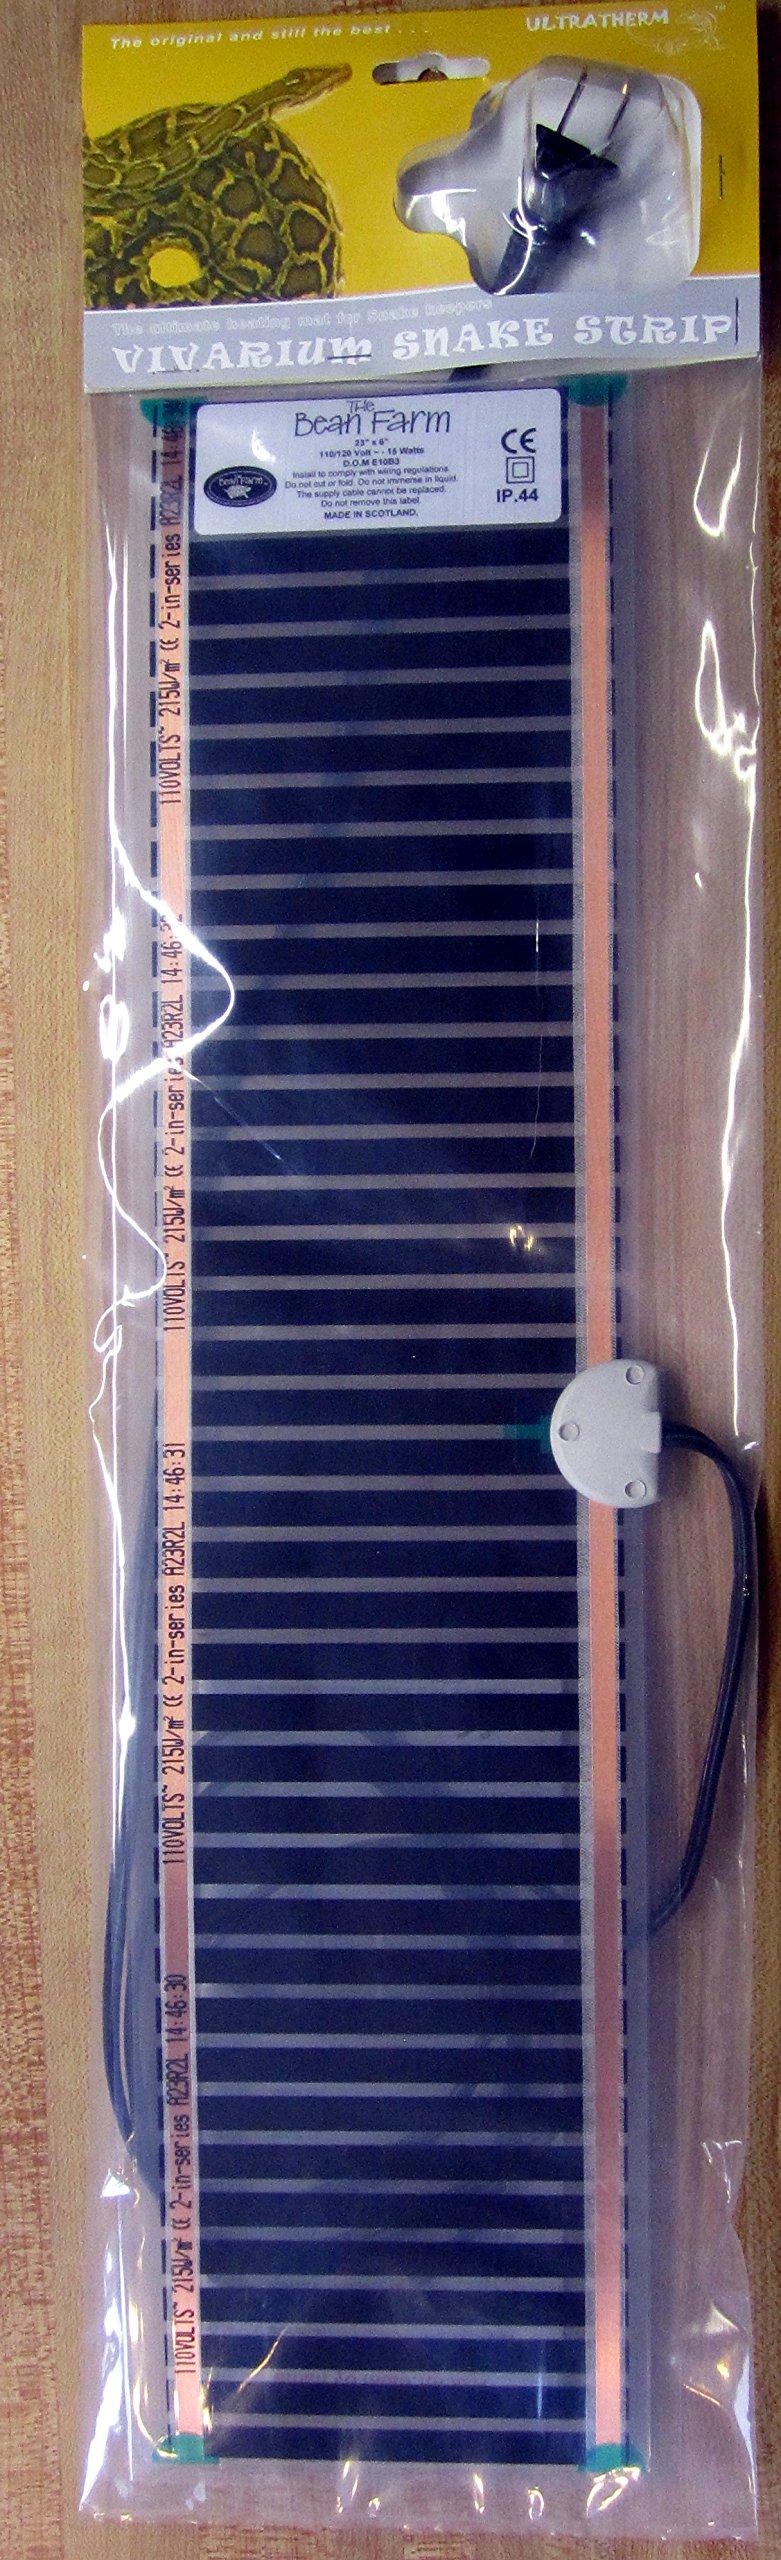 Ultratherm Under the Tank Heater, 6 x 35